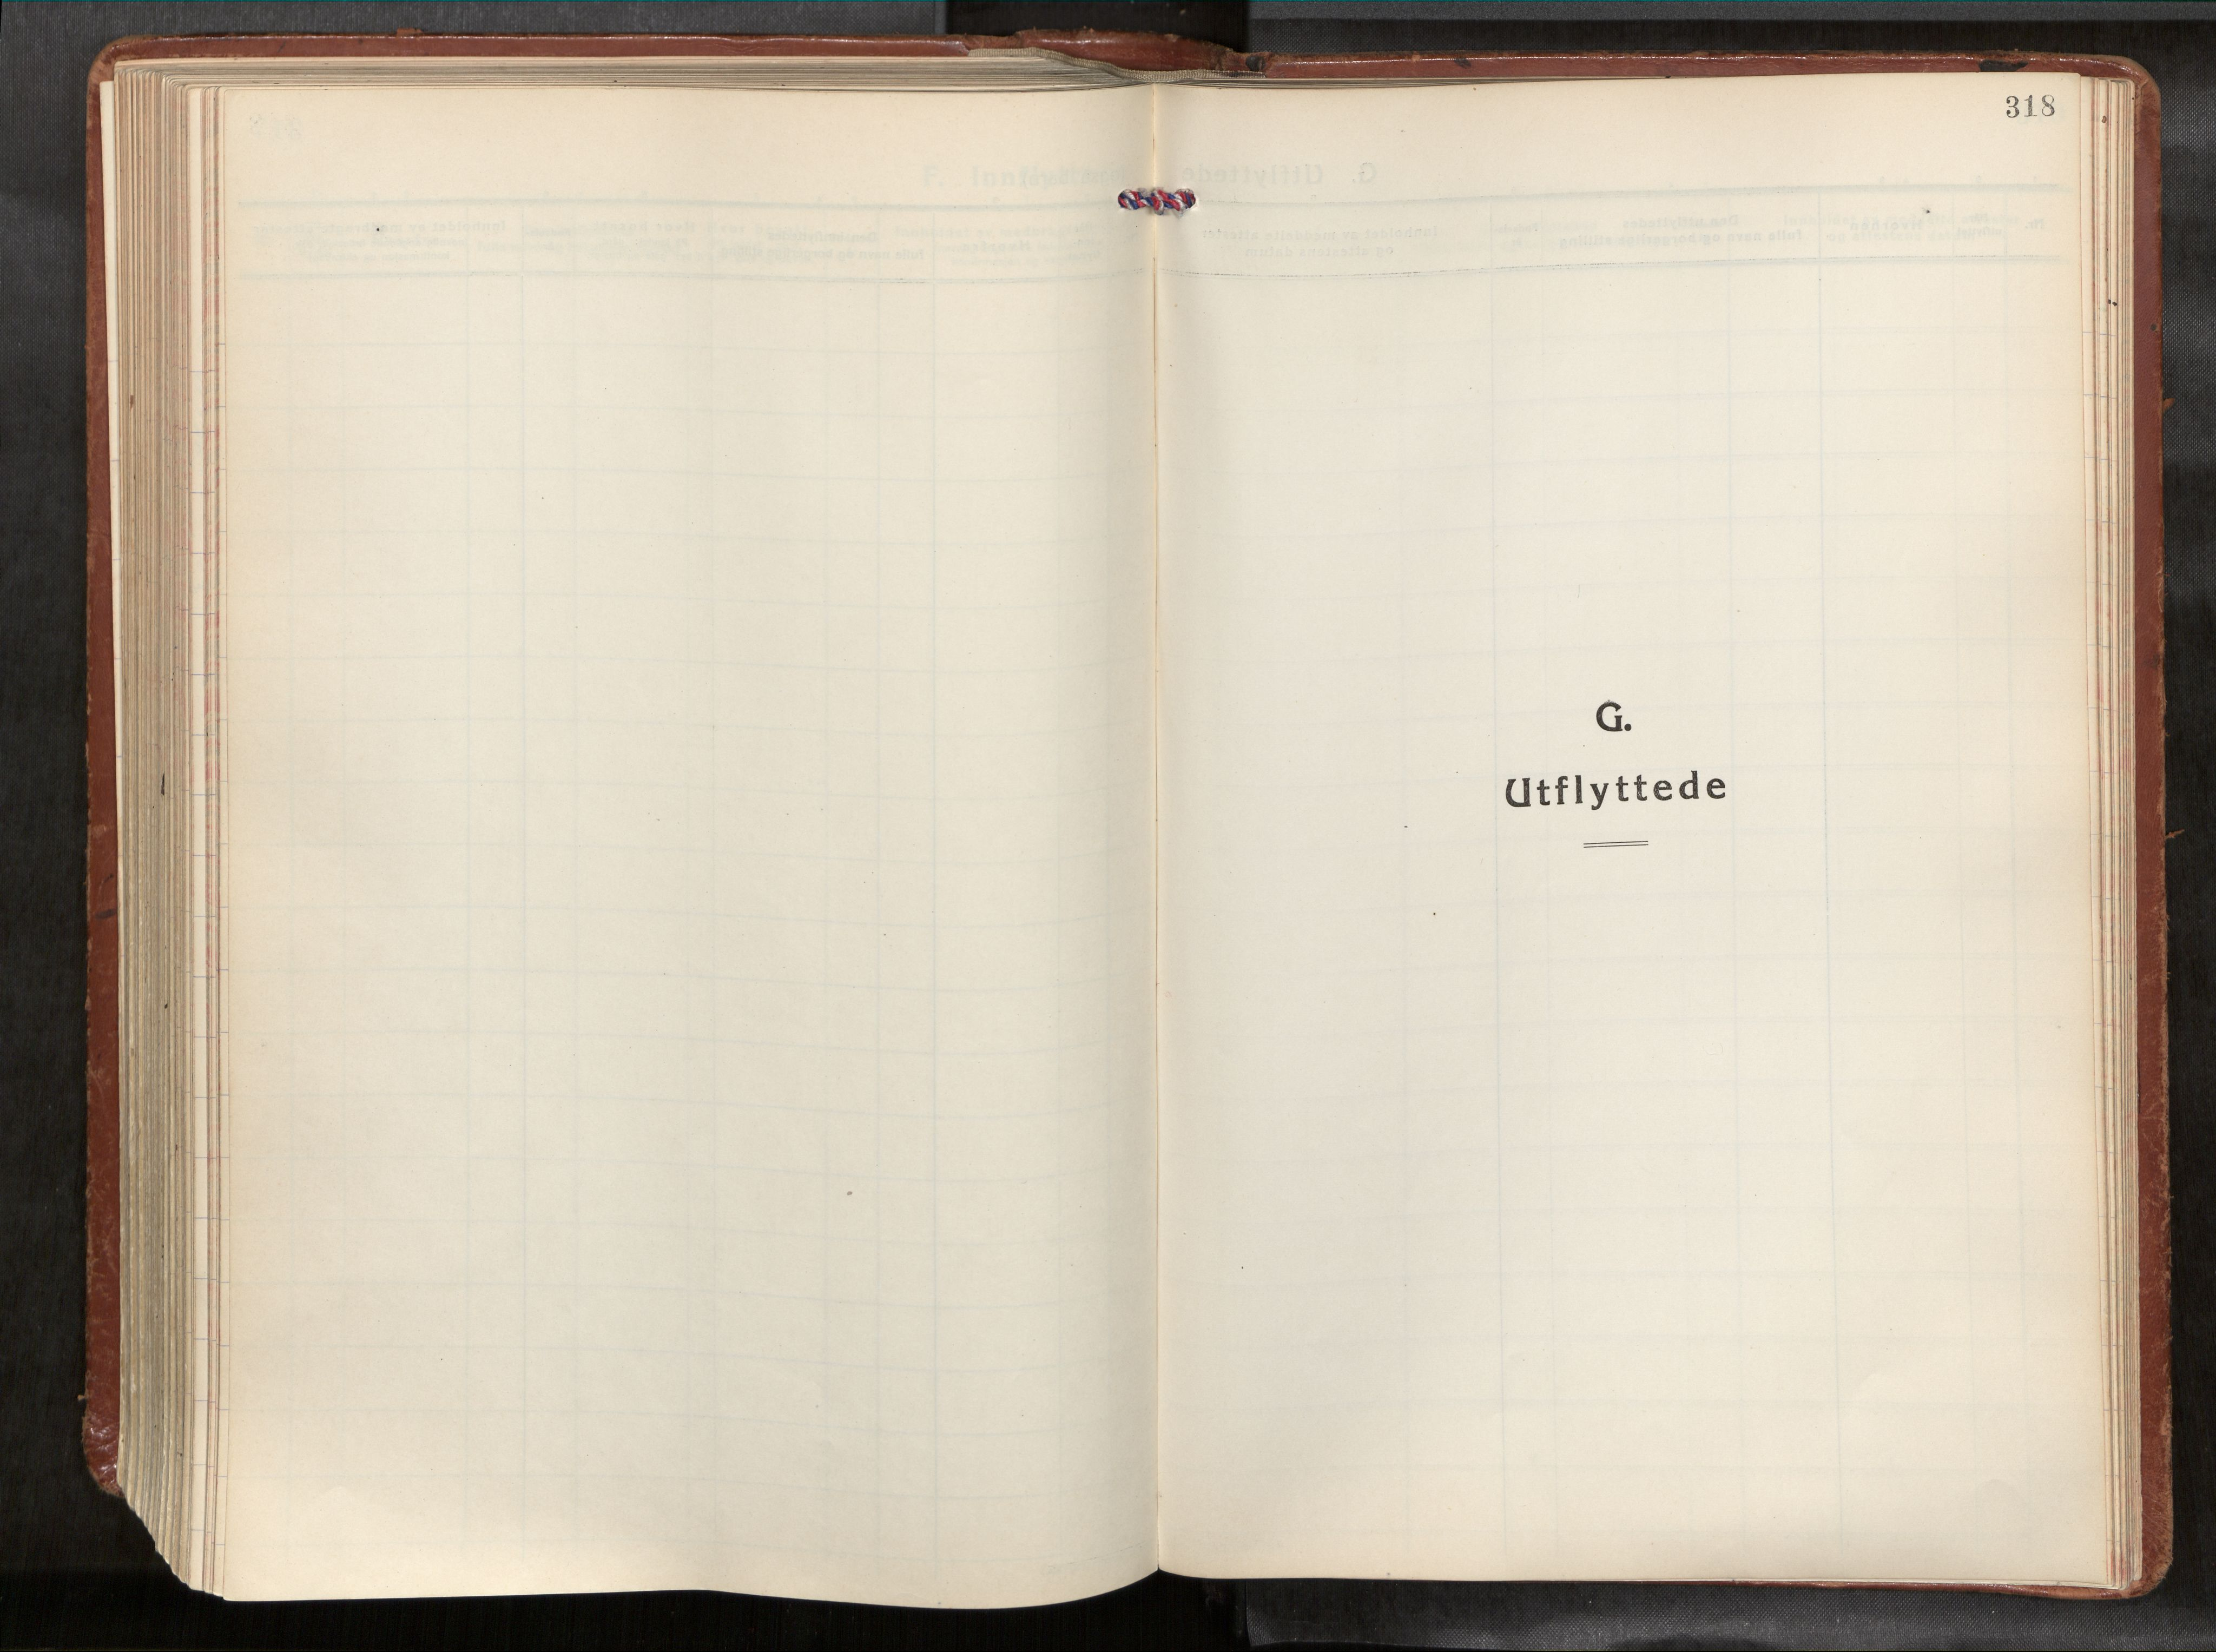 SAT, Ministerialprotokoller, klokkerbøker og fødselsregistre - Nordland, 881/L1161: Ministerialbok nr. 881A14, 1932-1955, s. 318